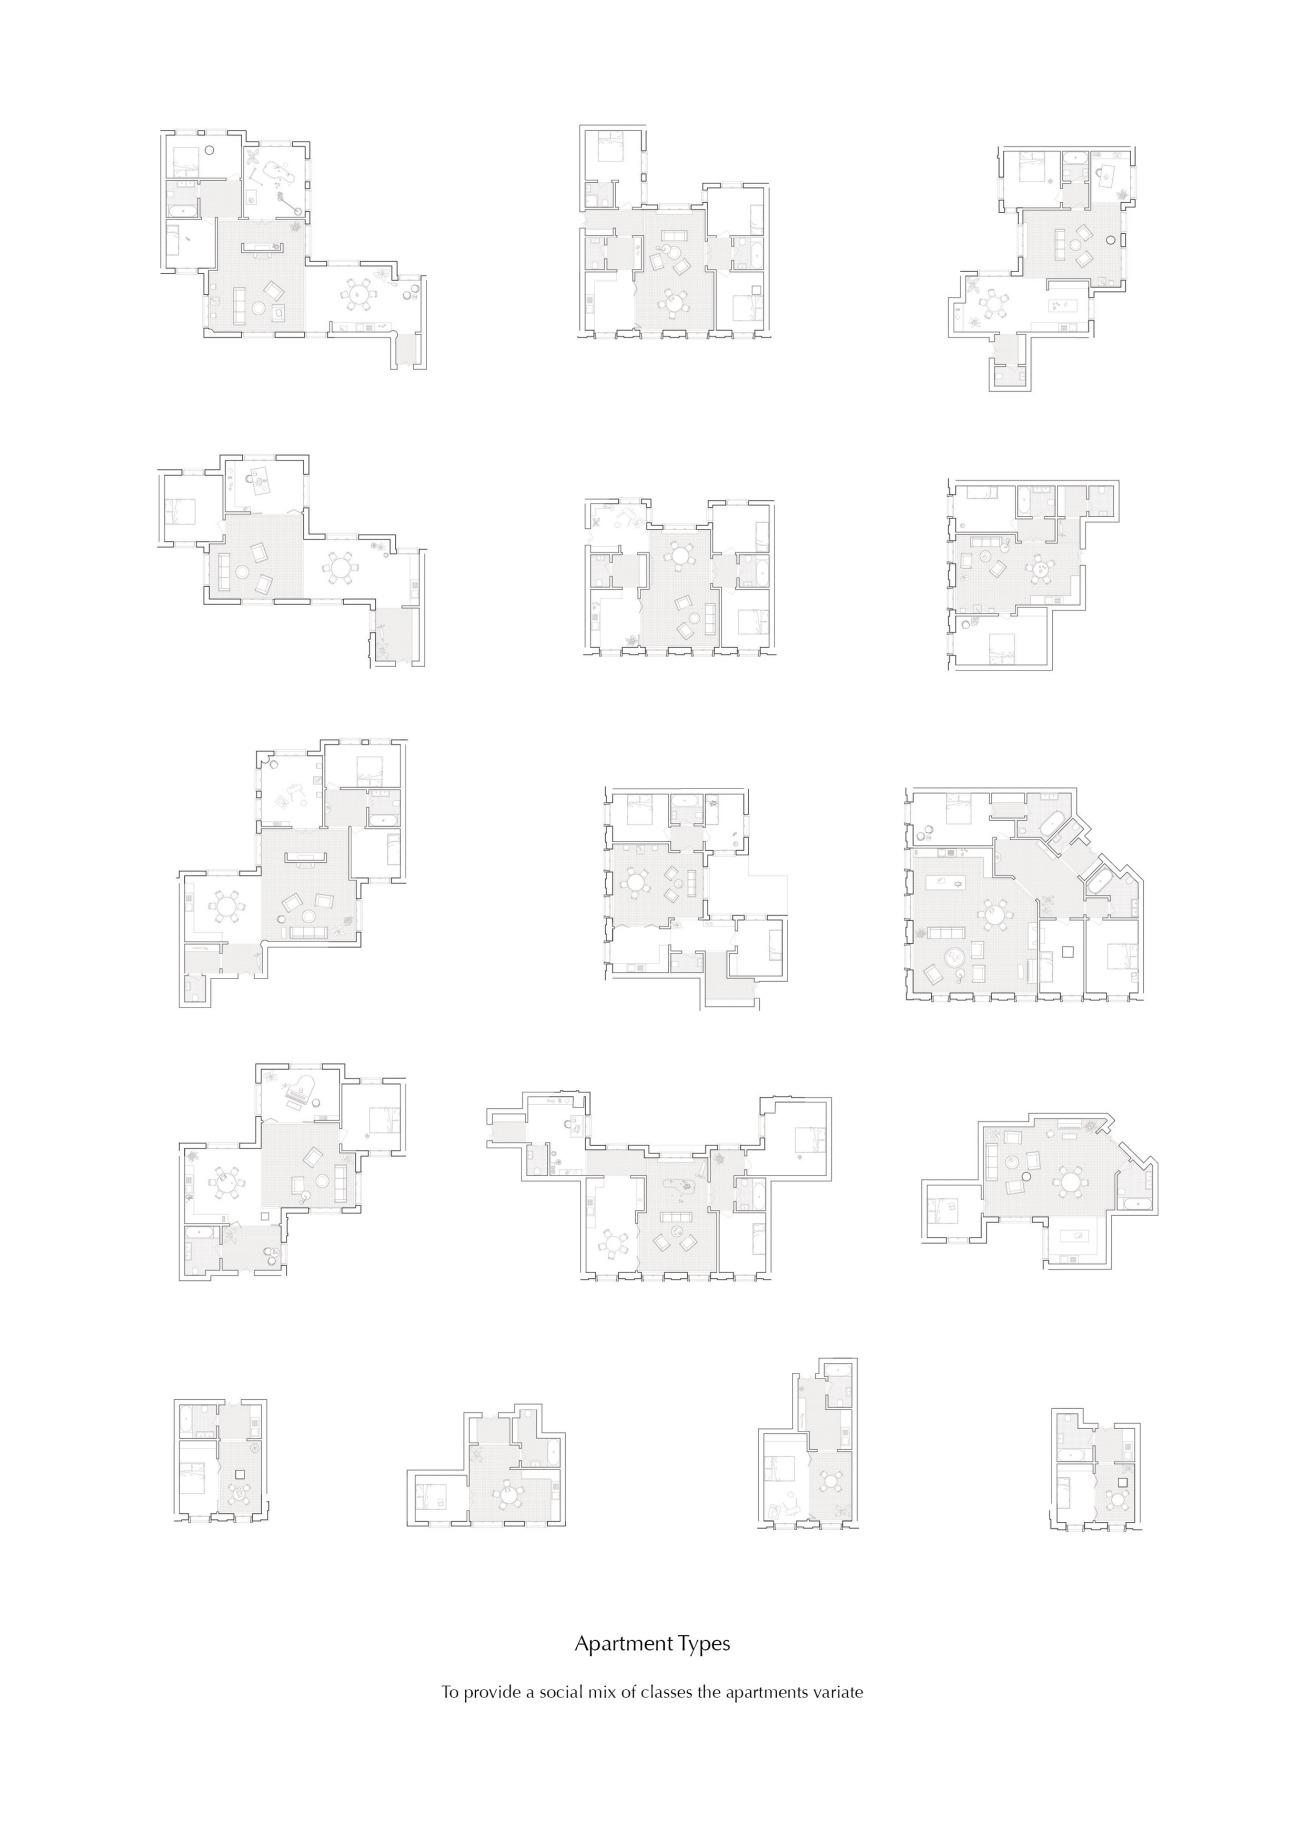 Megastructures -Reuse and Extension Karstadt Munich, Lena Teresa Kohl, Master Thesis, (2016, Technical University of Munich) 19